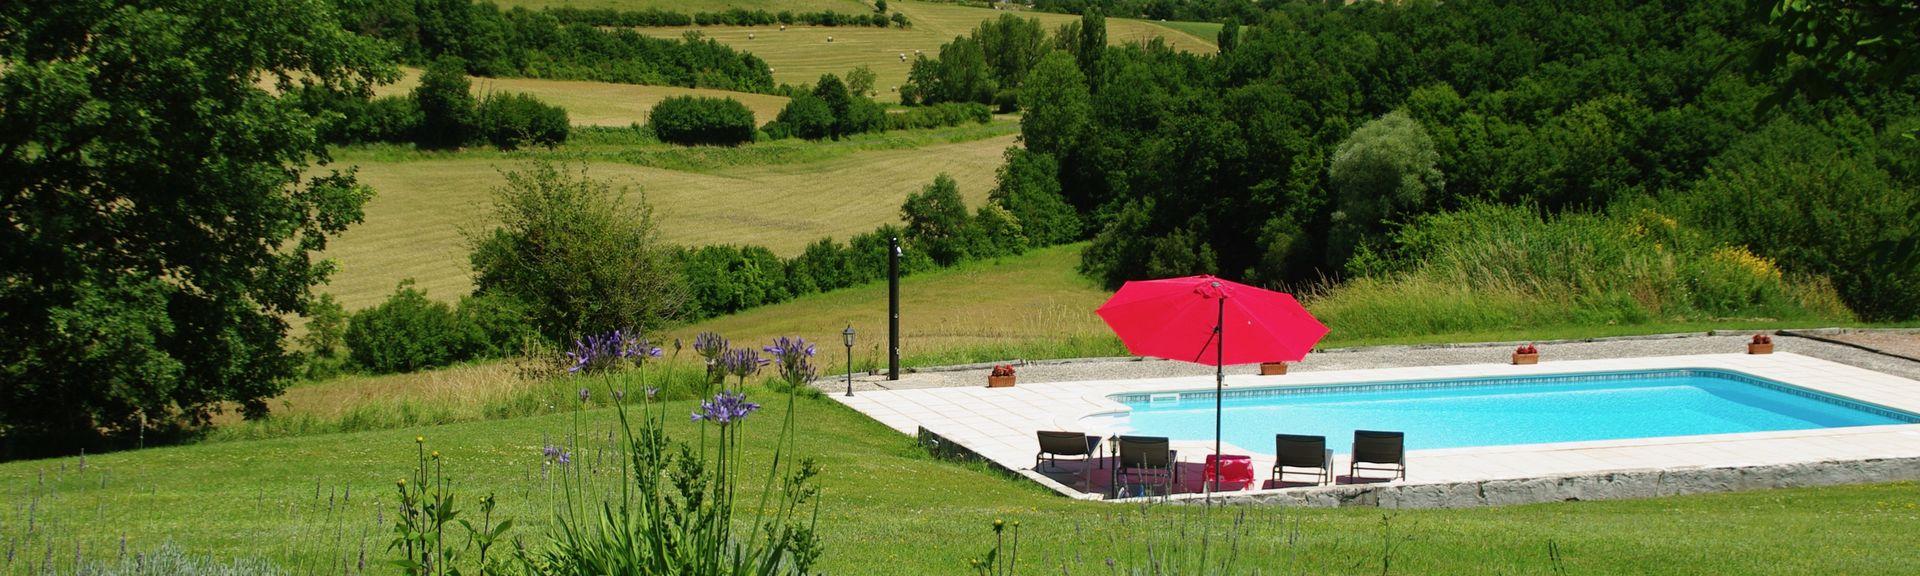 Fronton, France